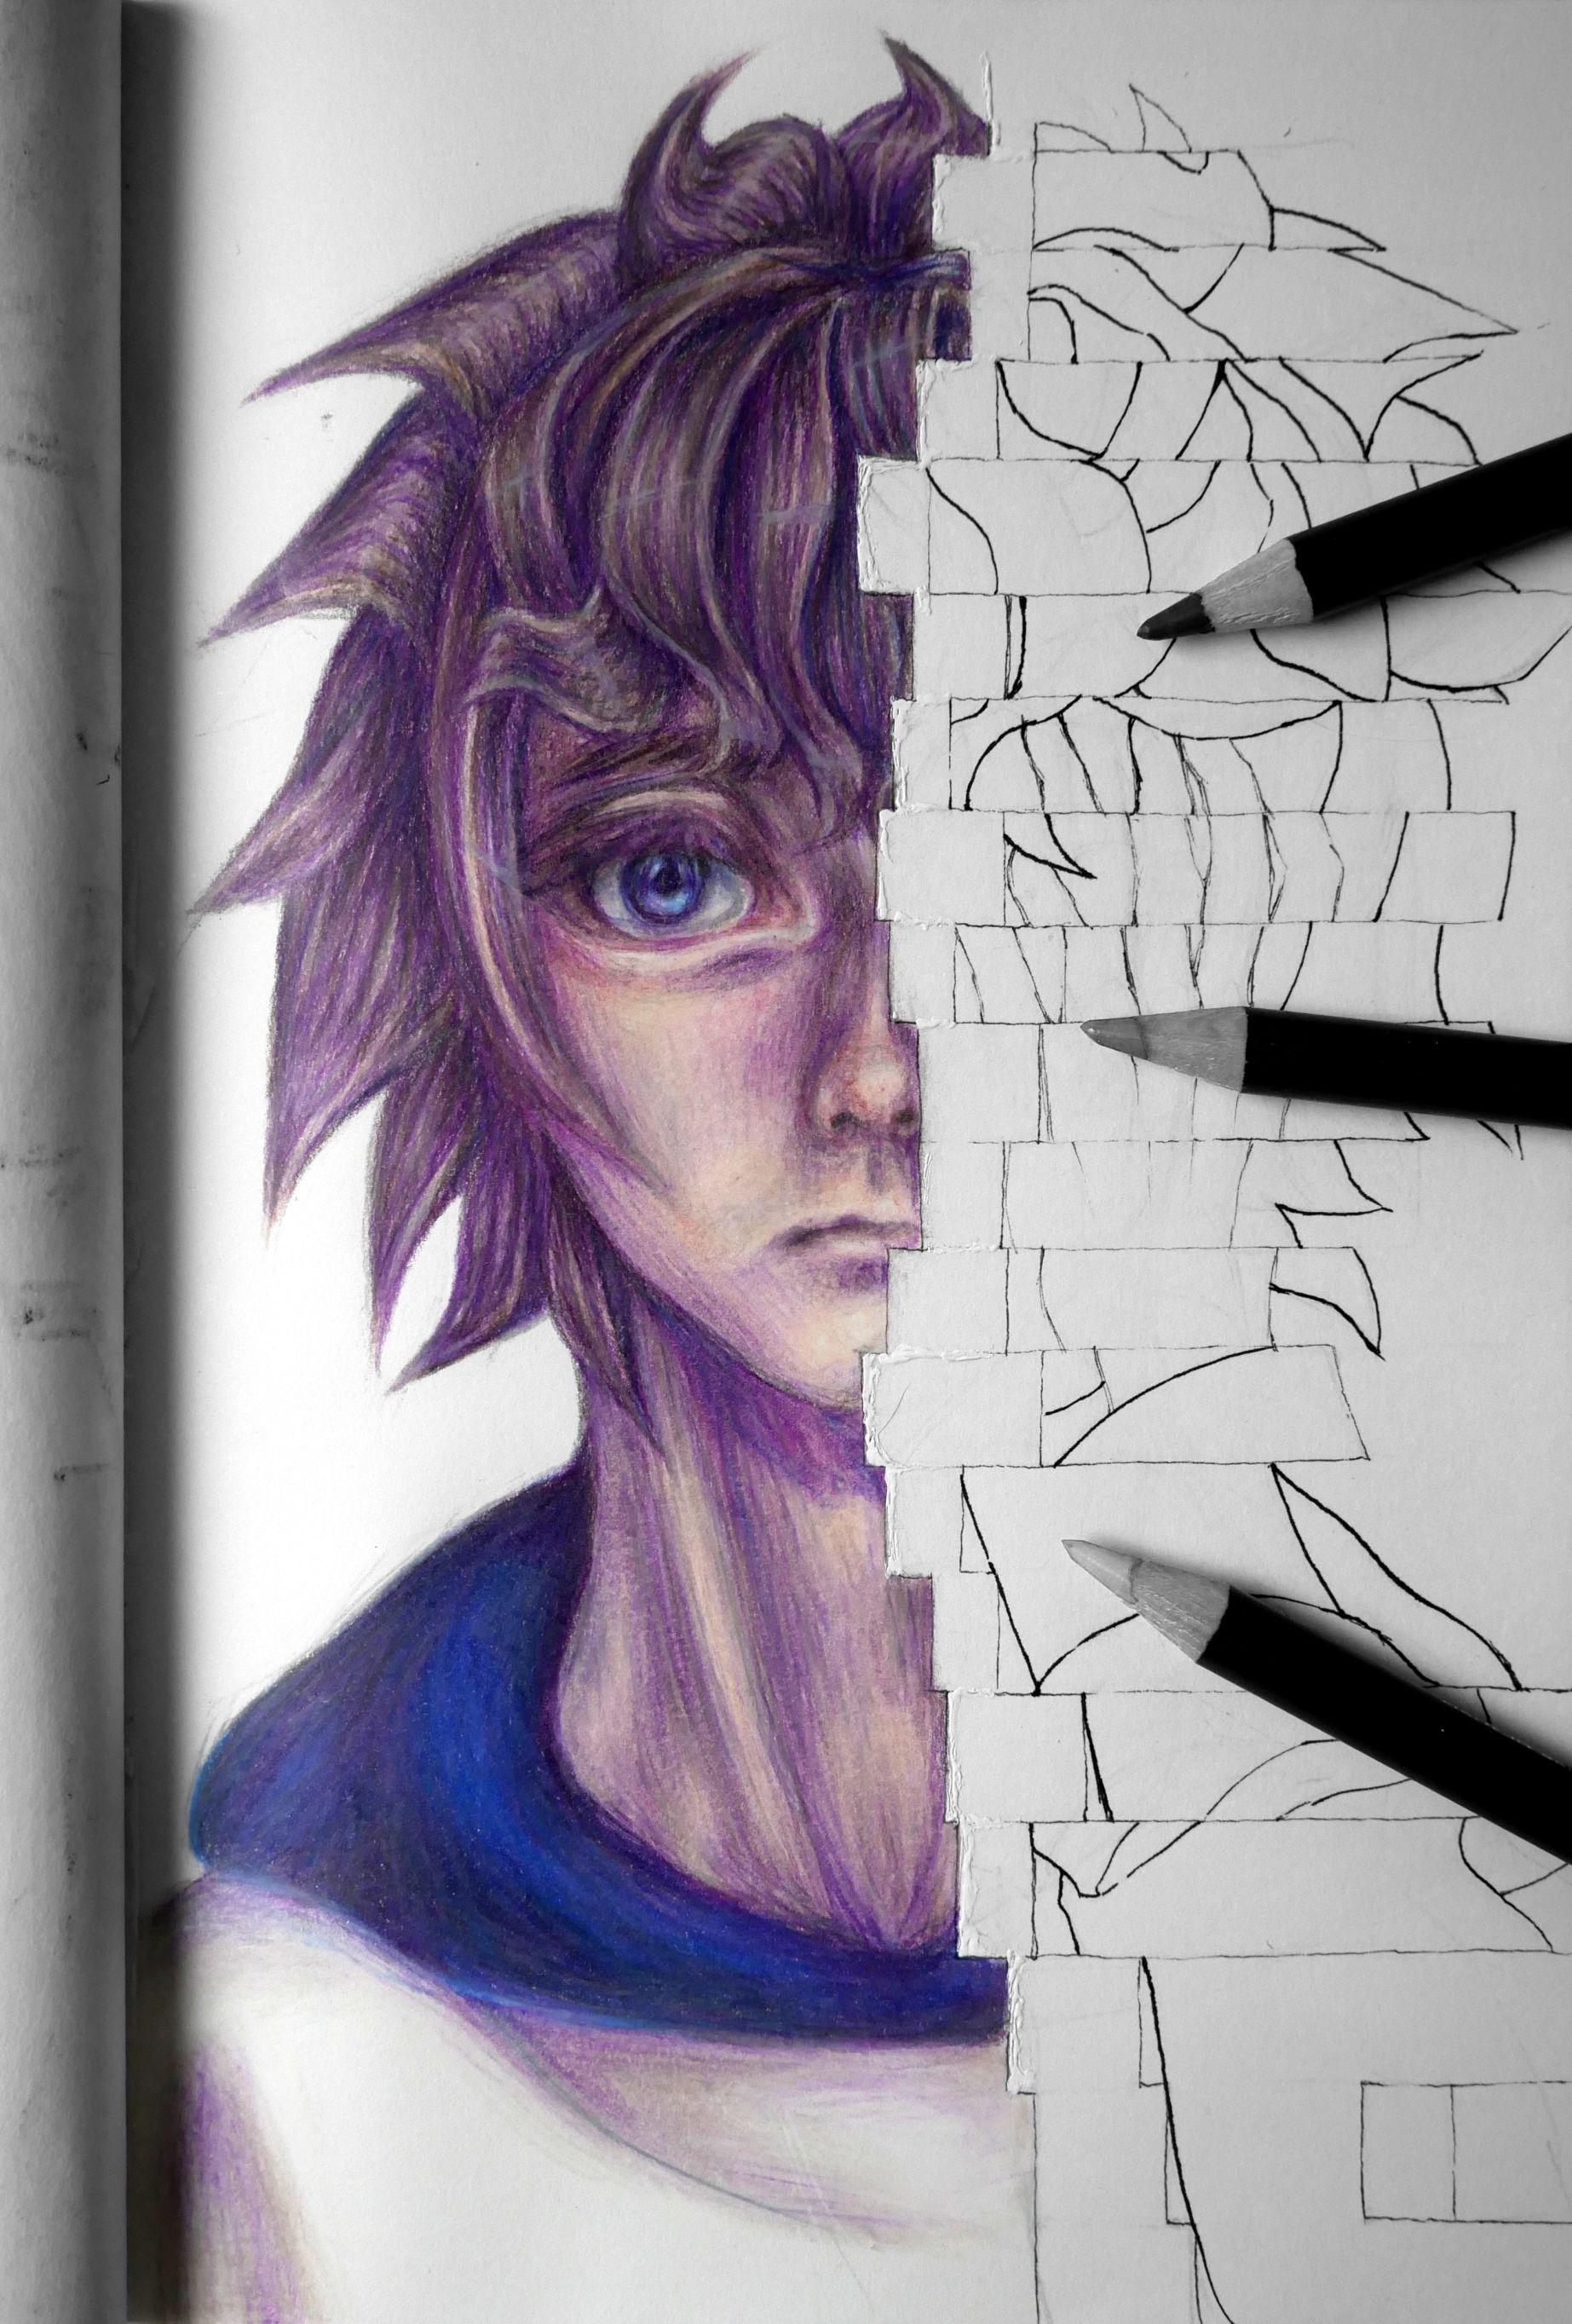 Manga Boy Colored Pencils Drawing Color Pencil Drawing Coloured Pencils Colored Pencils